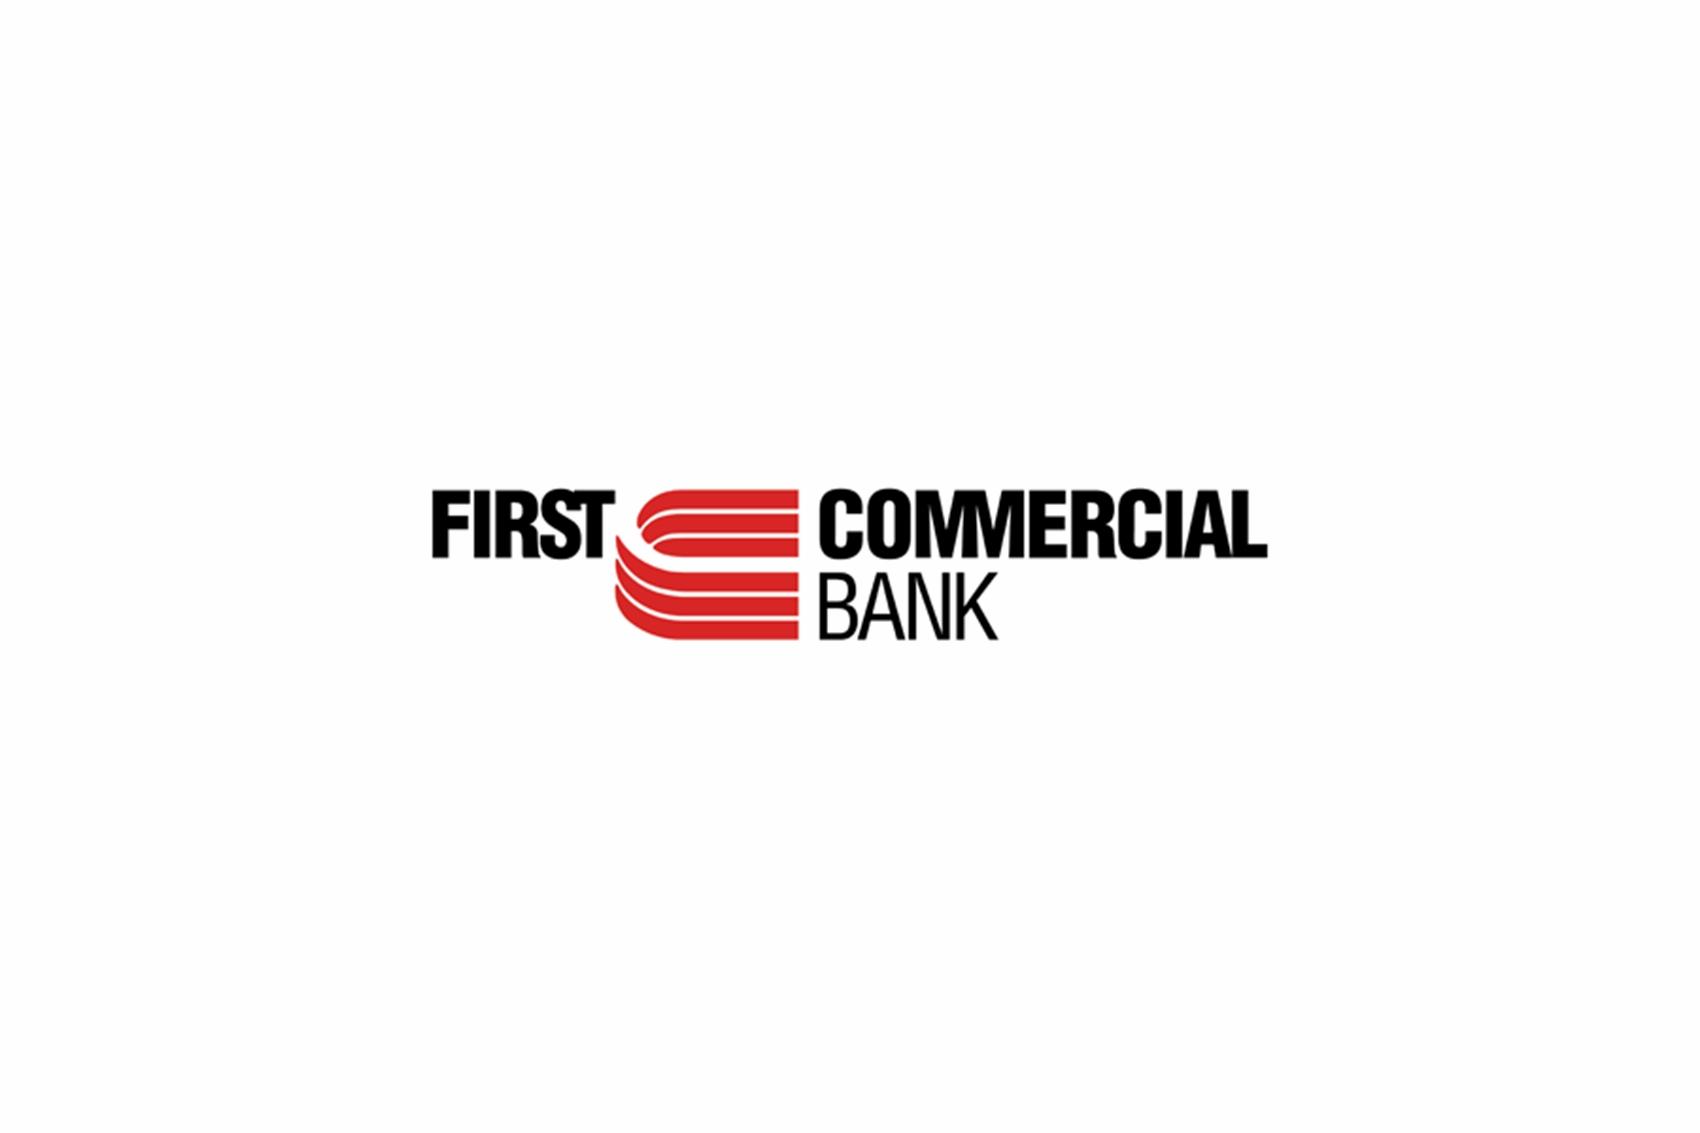 first commercial bank credit card payment login address customer service. Black Bedroom Furniture Sets. Home Design Ideas